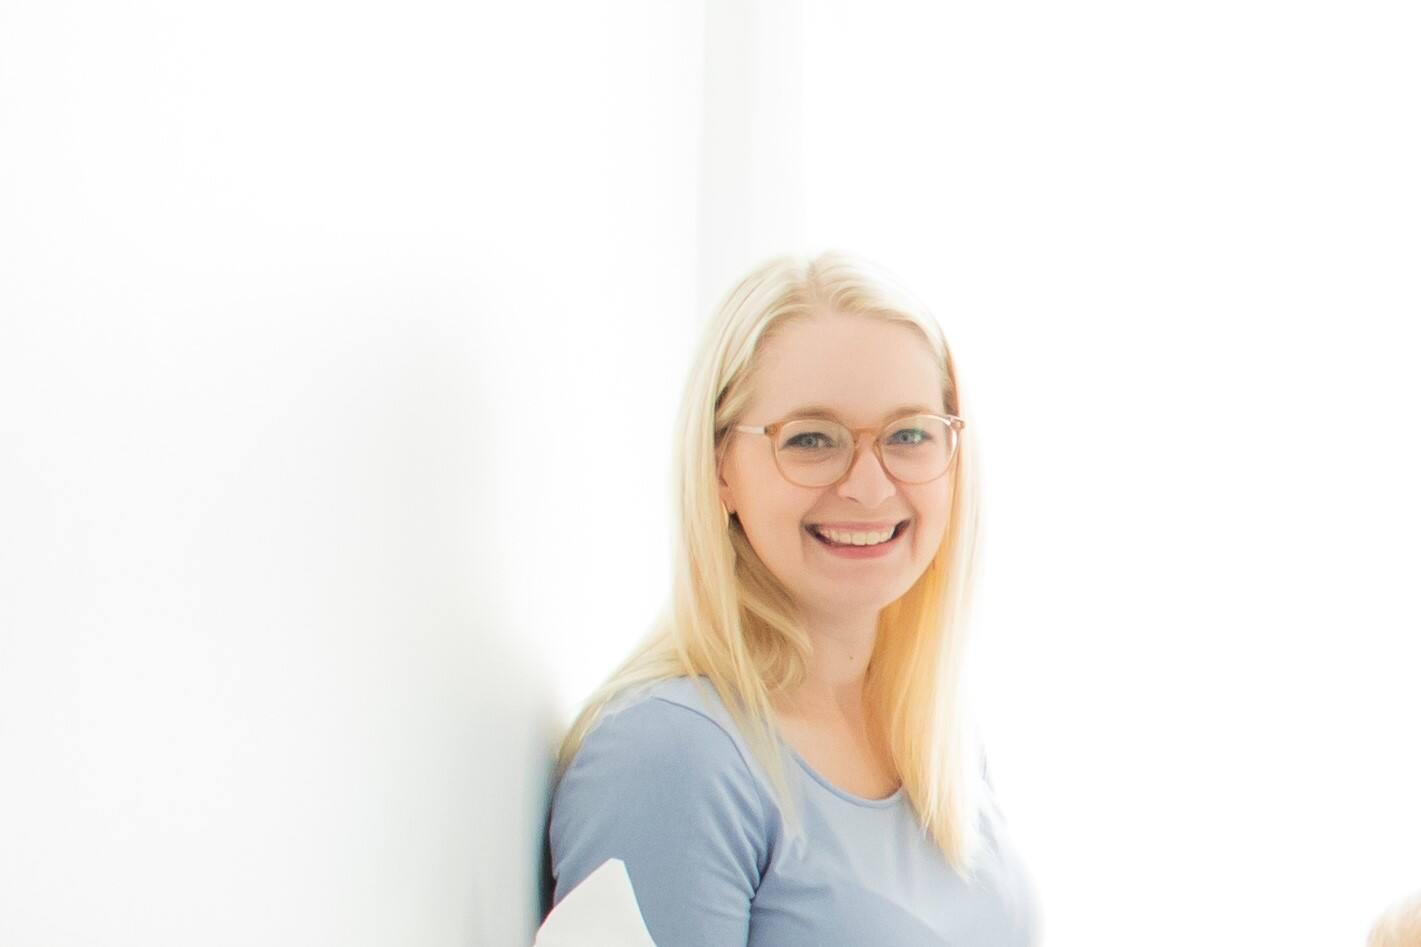 Article Author Megan Wood